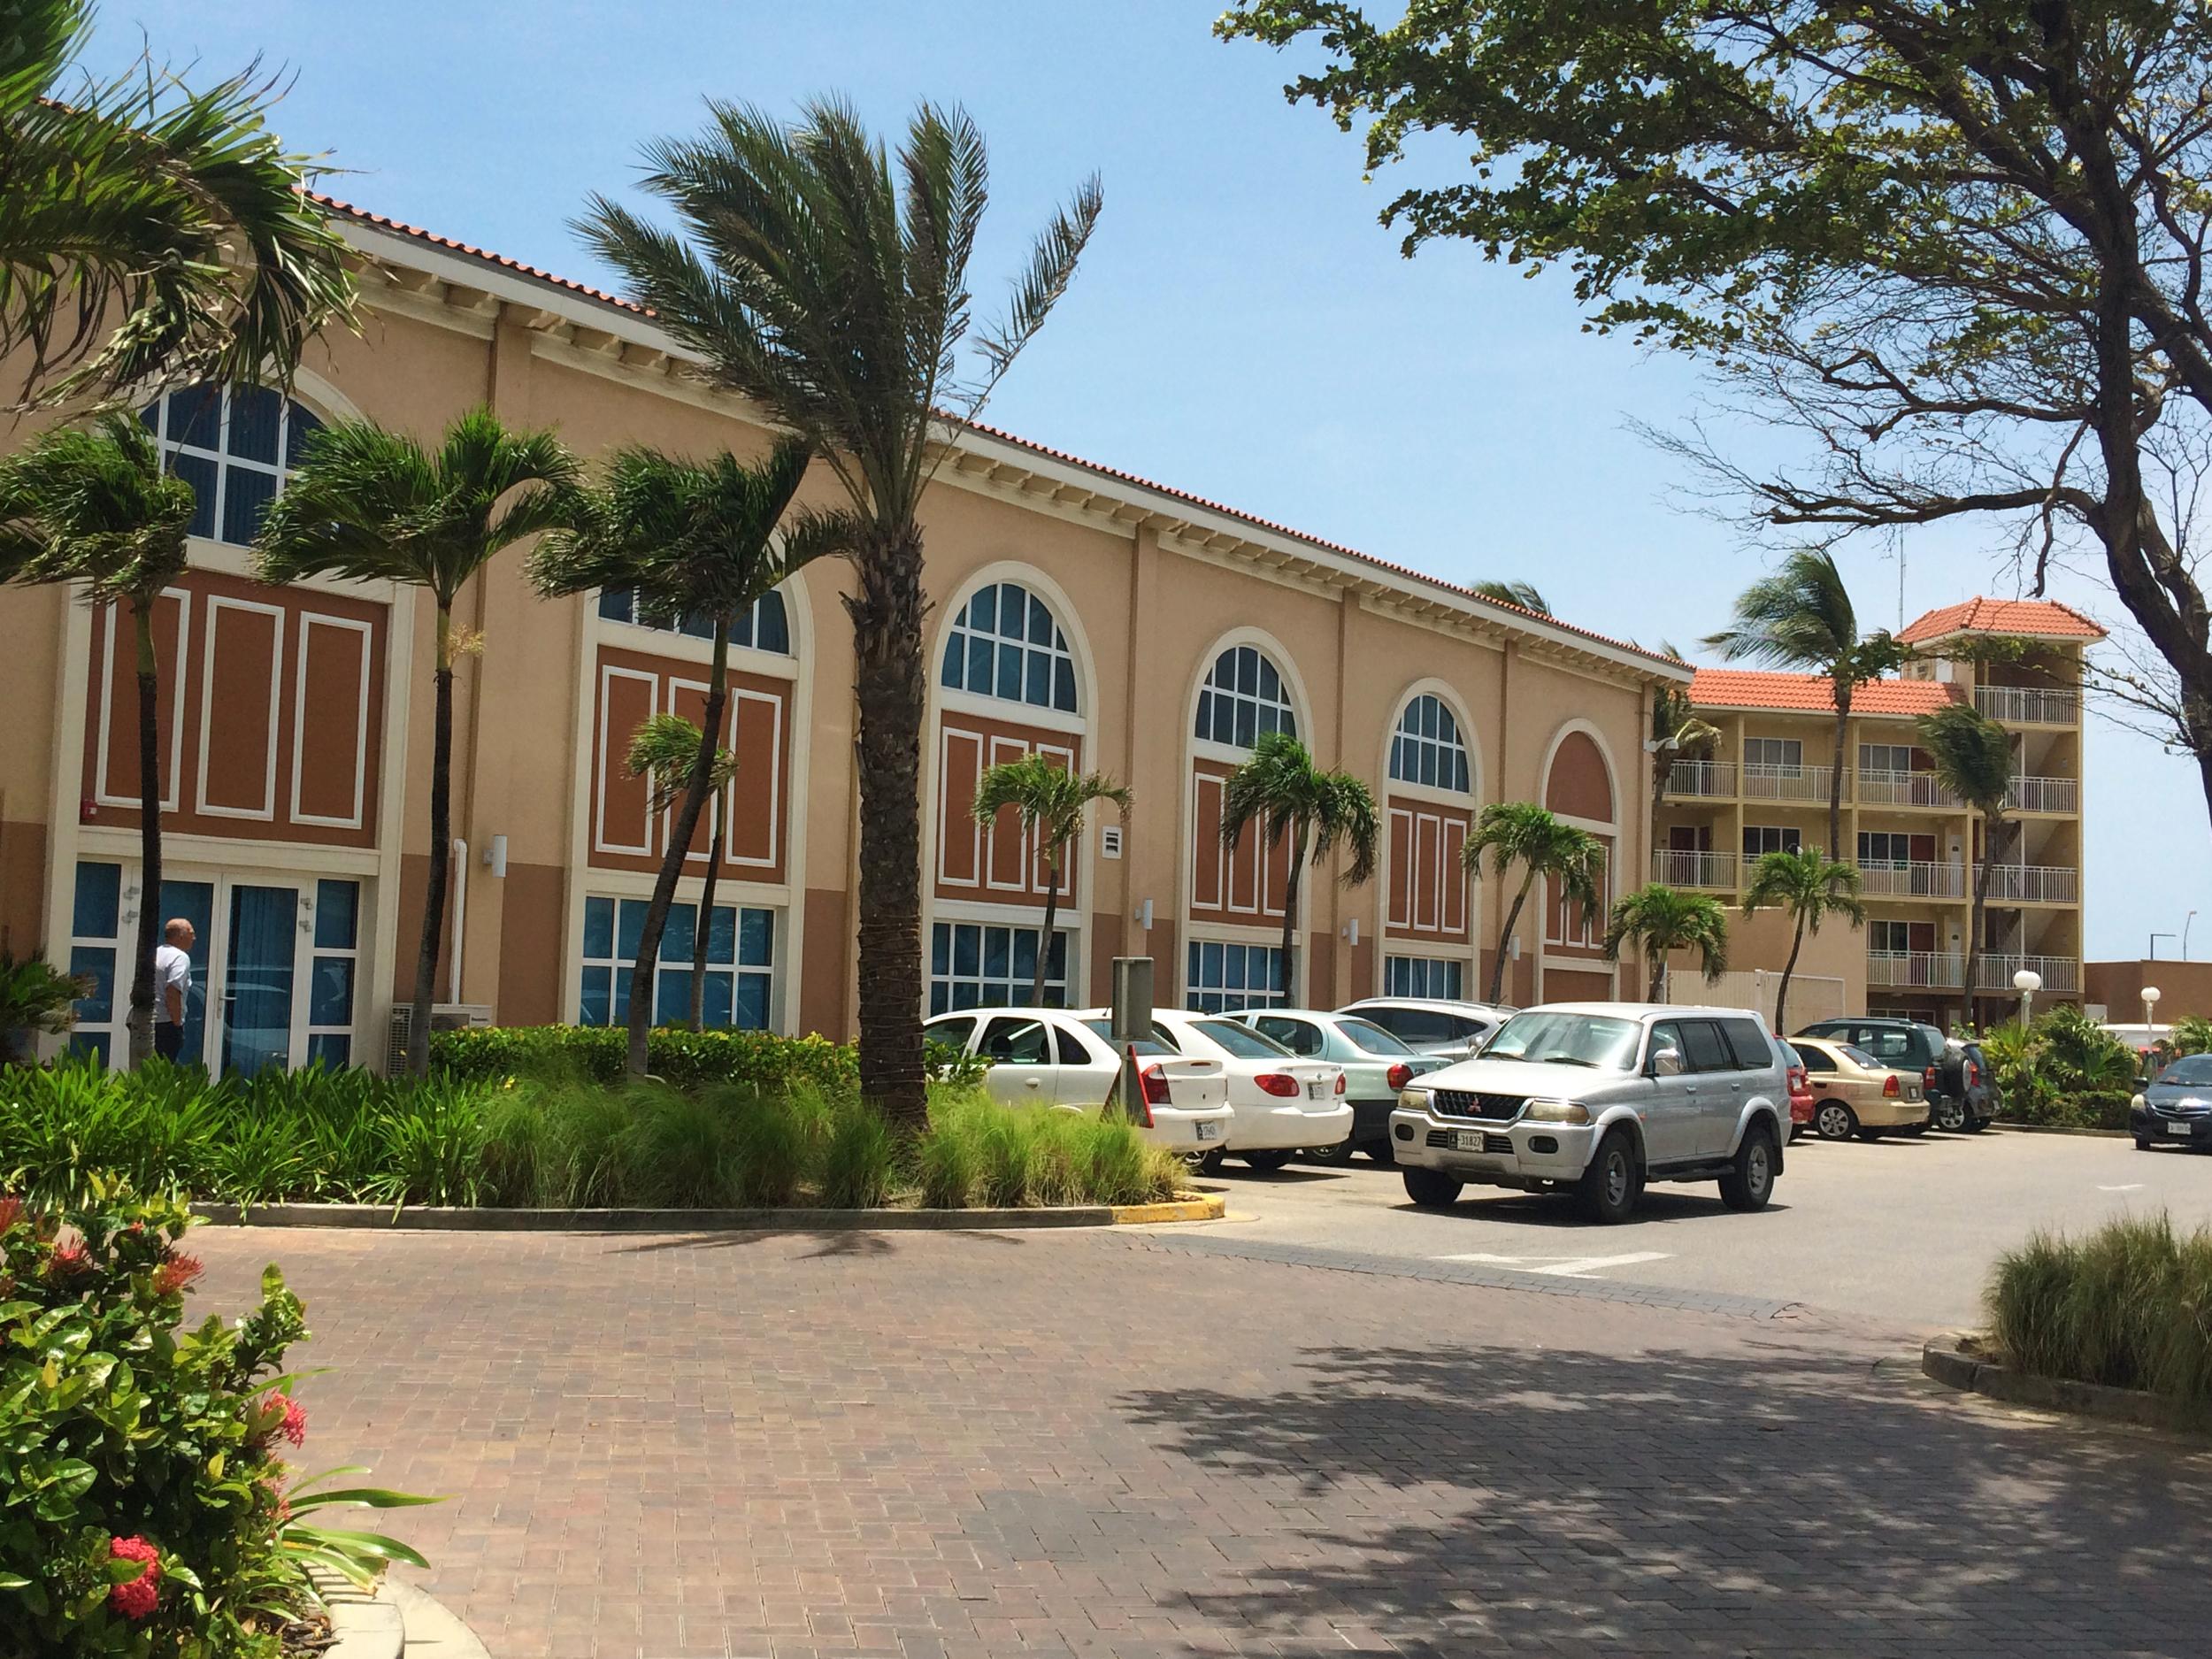 Side view of my hotel,  La Cabana